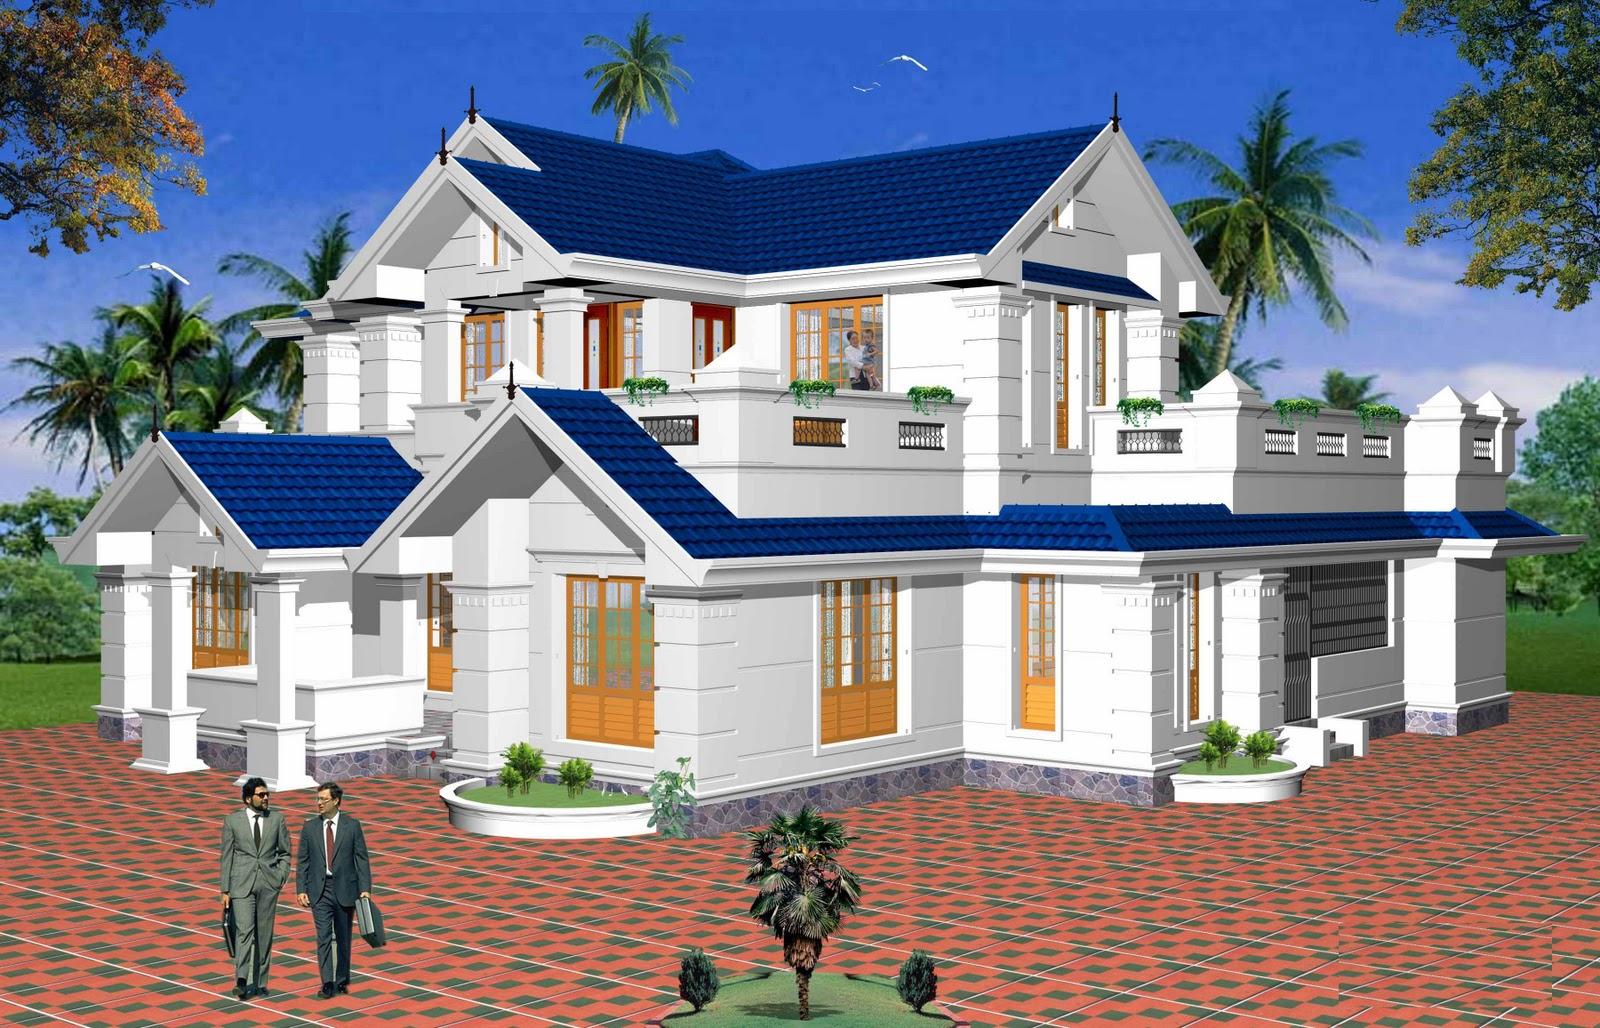 New home designs latest.: Beautiful latest modern home ... on Beautiful Home Decor  id=11971